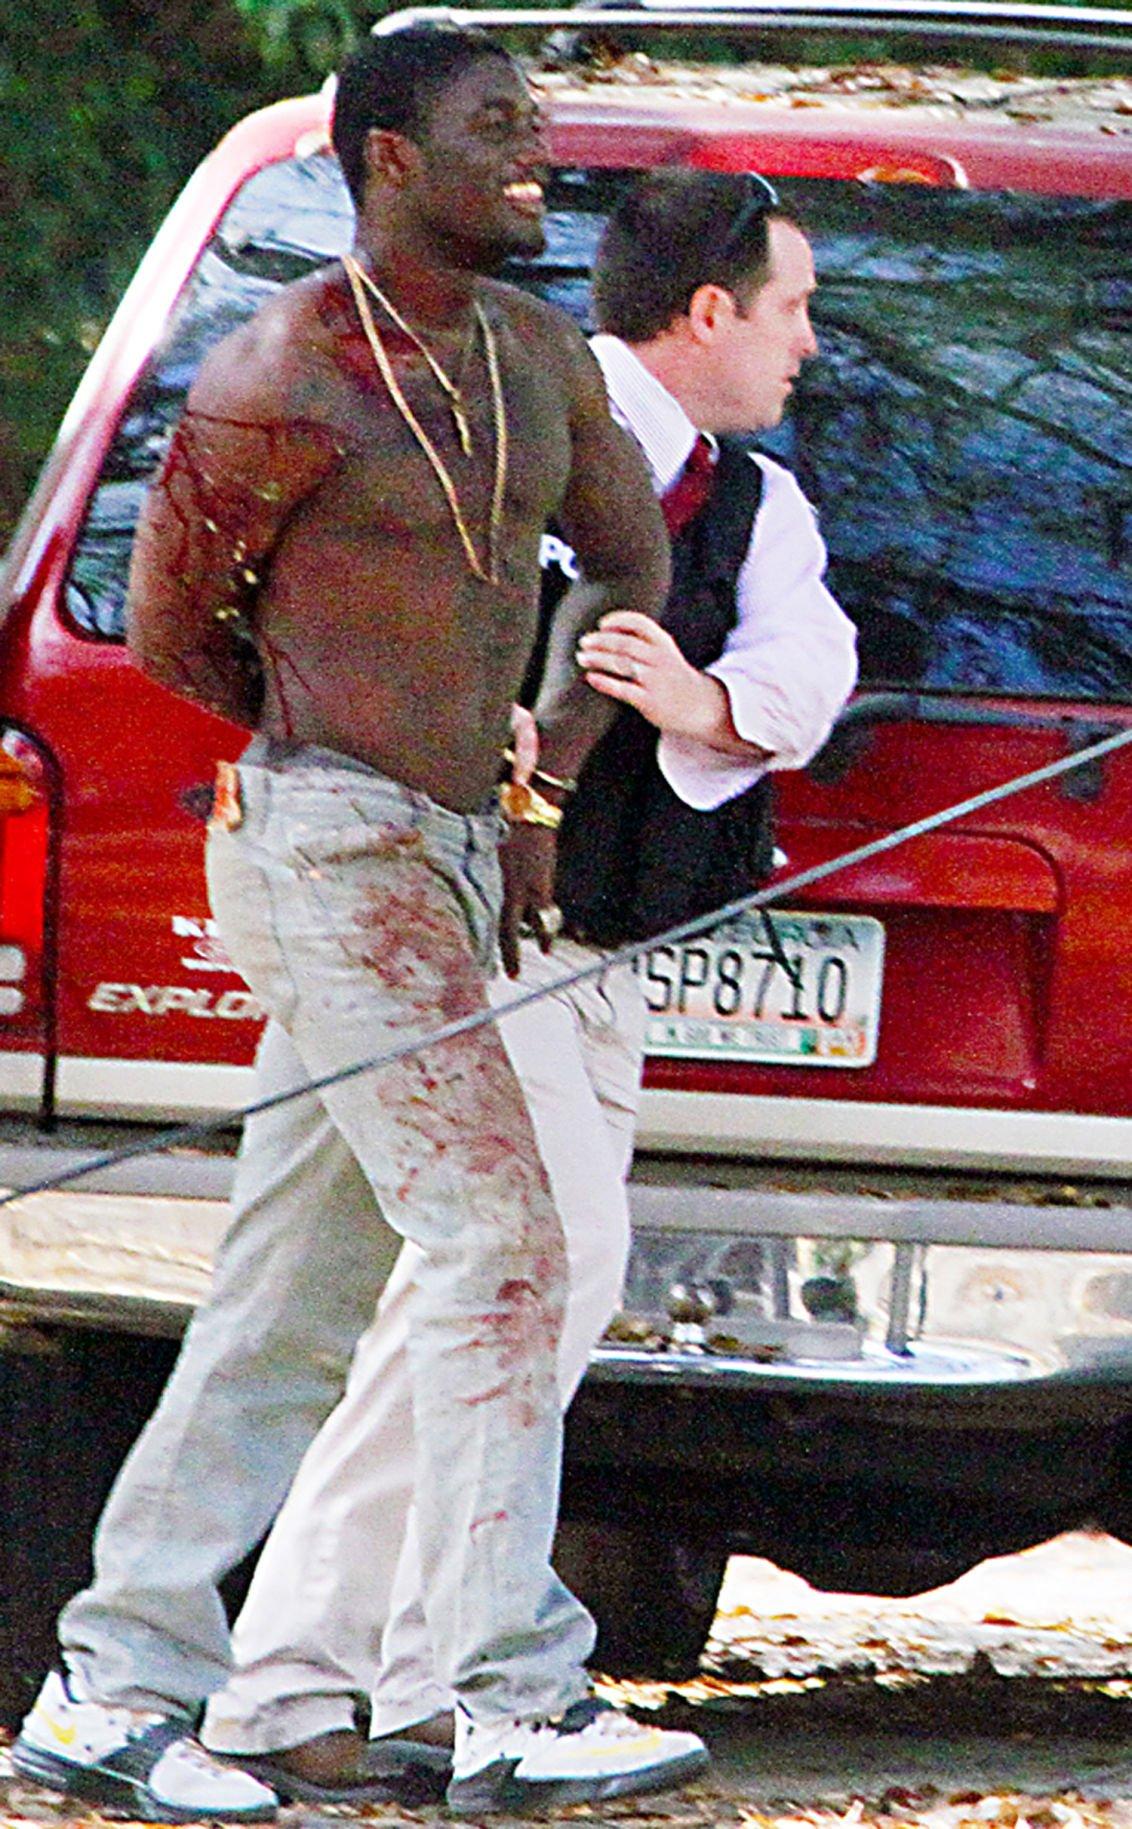 Apprehended Shooting suspect in custody